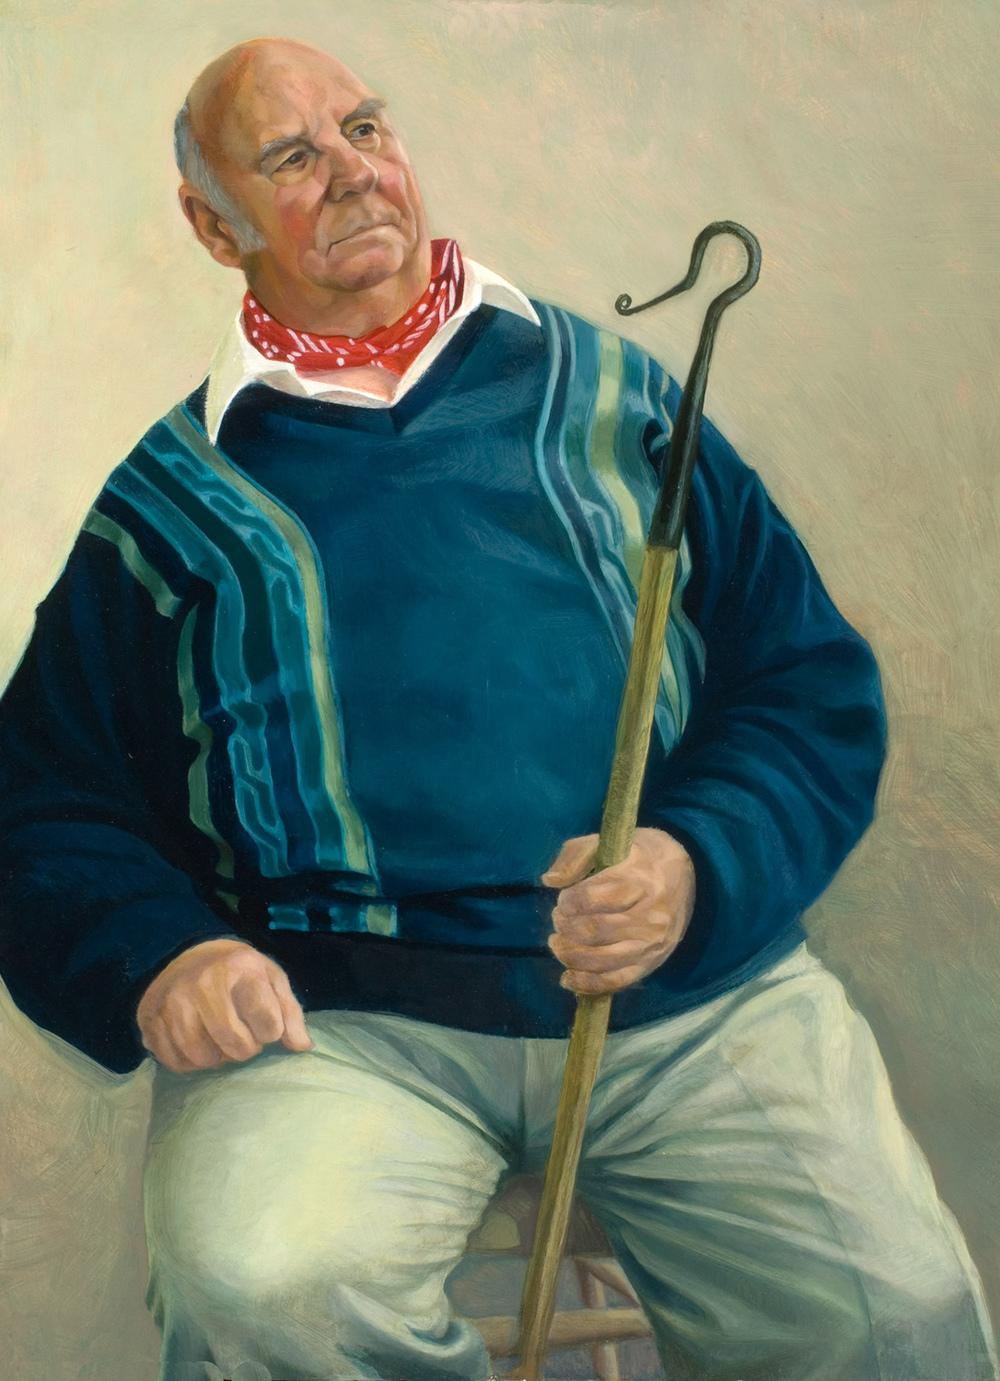 "'Larry Skeats, Retired Shepherd, Dorset' oil on gesso panel 56x40cm(22""x16""). Girton College, Cambridge."